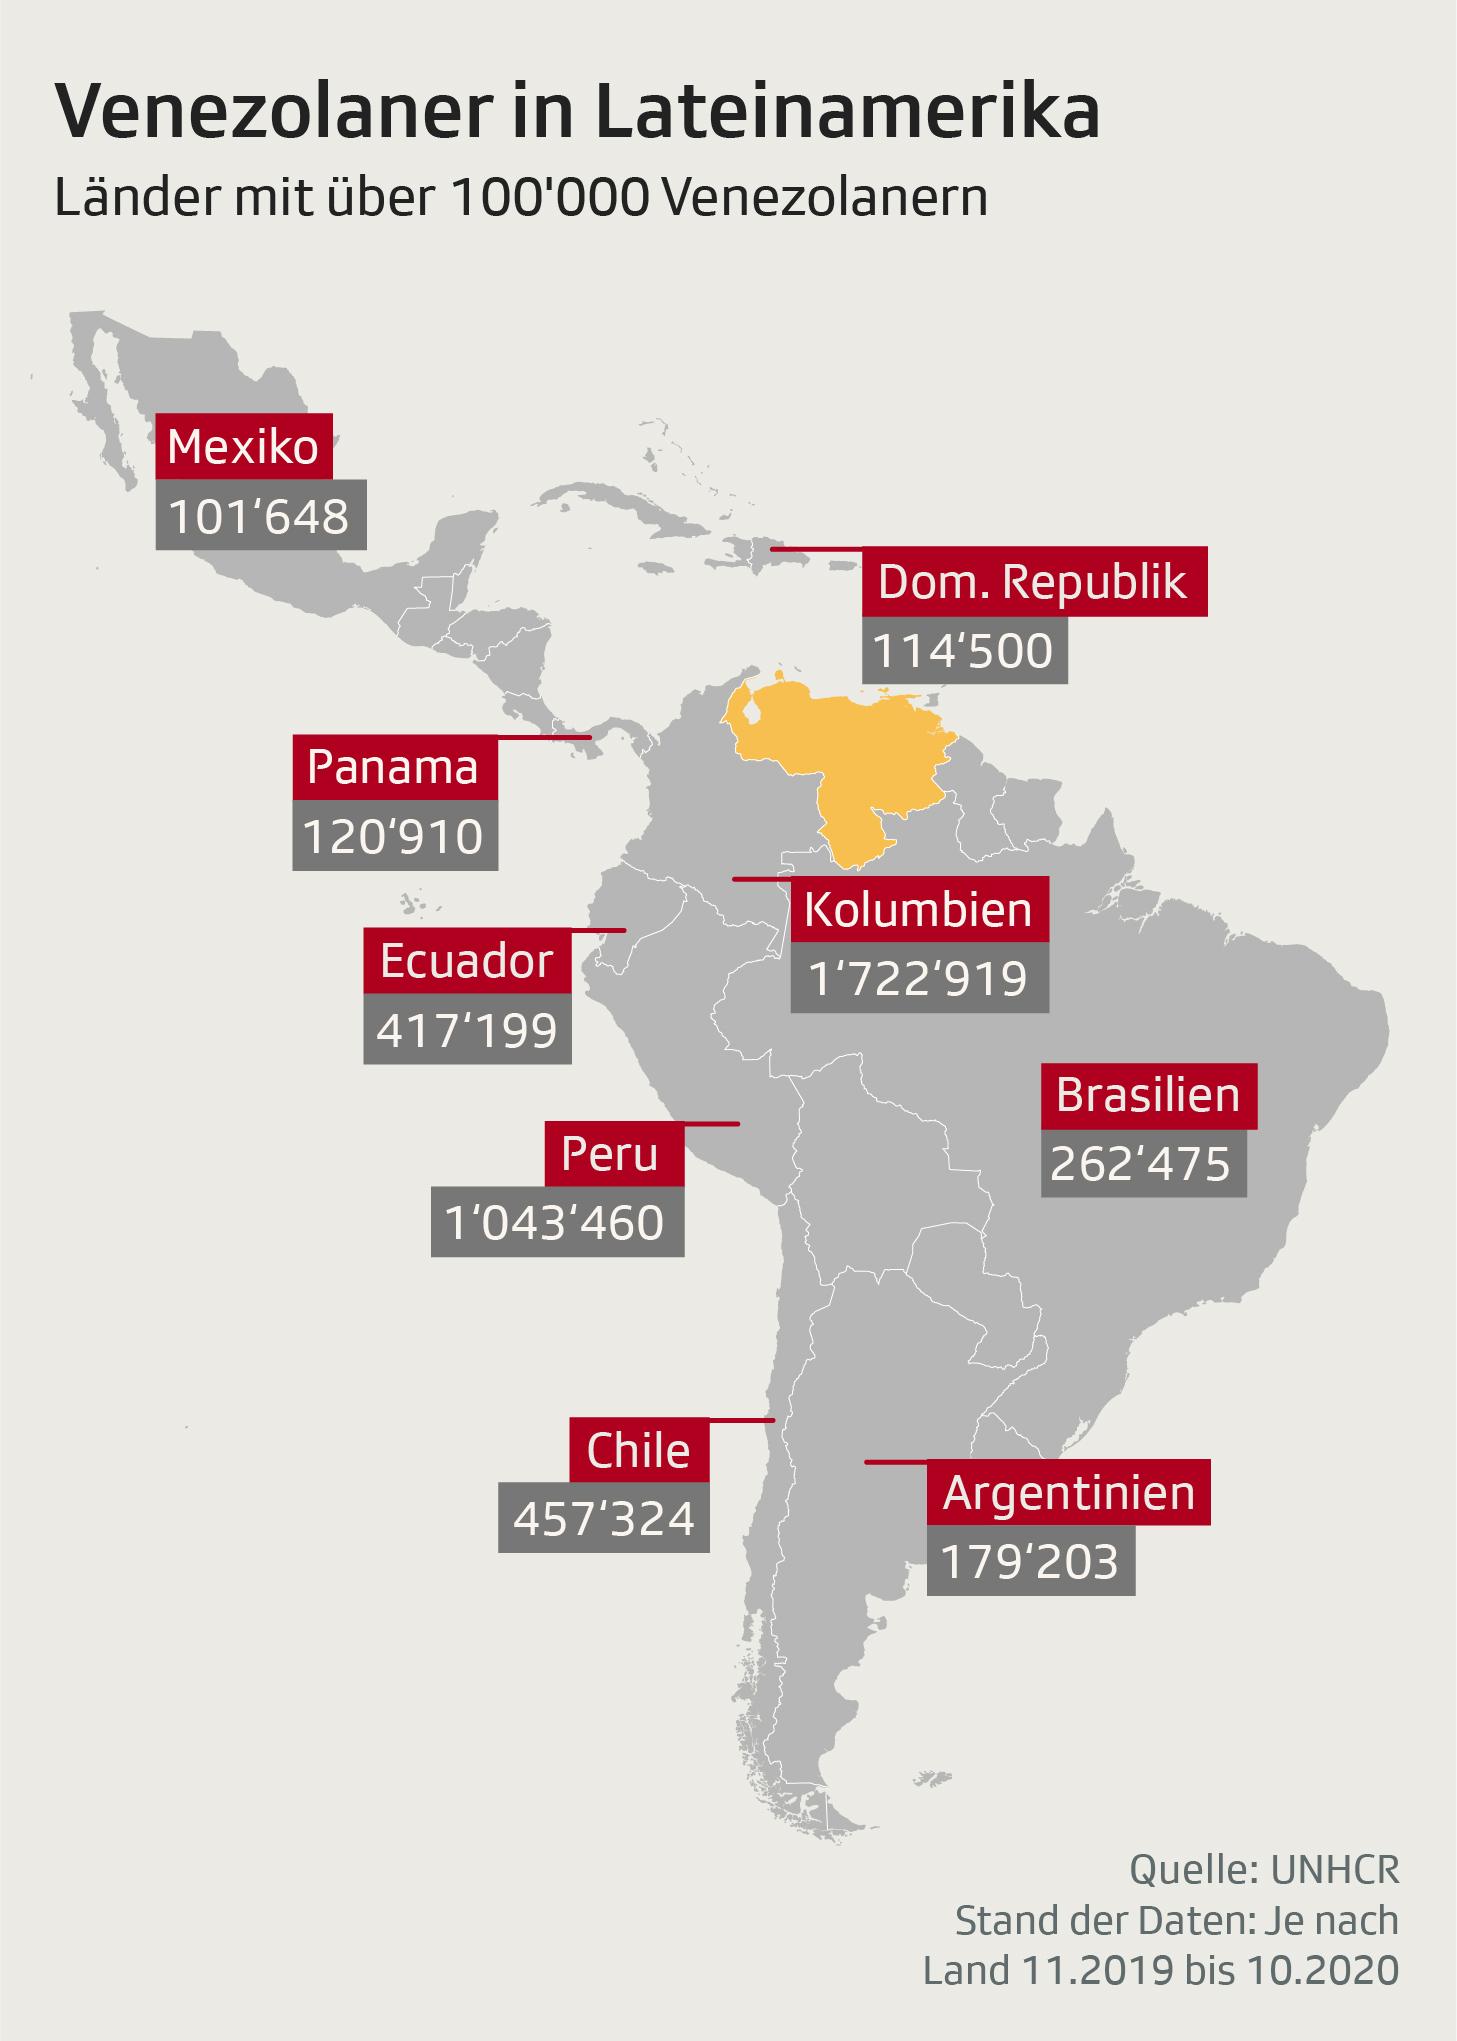 Venezolaner in Lateinamerika